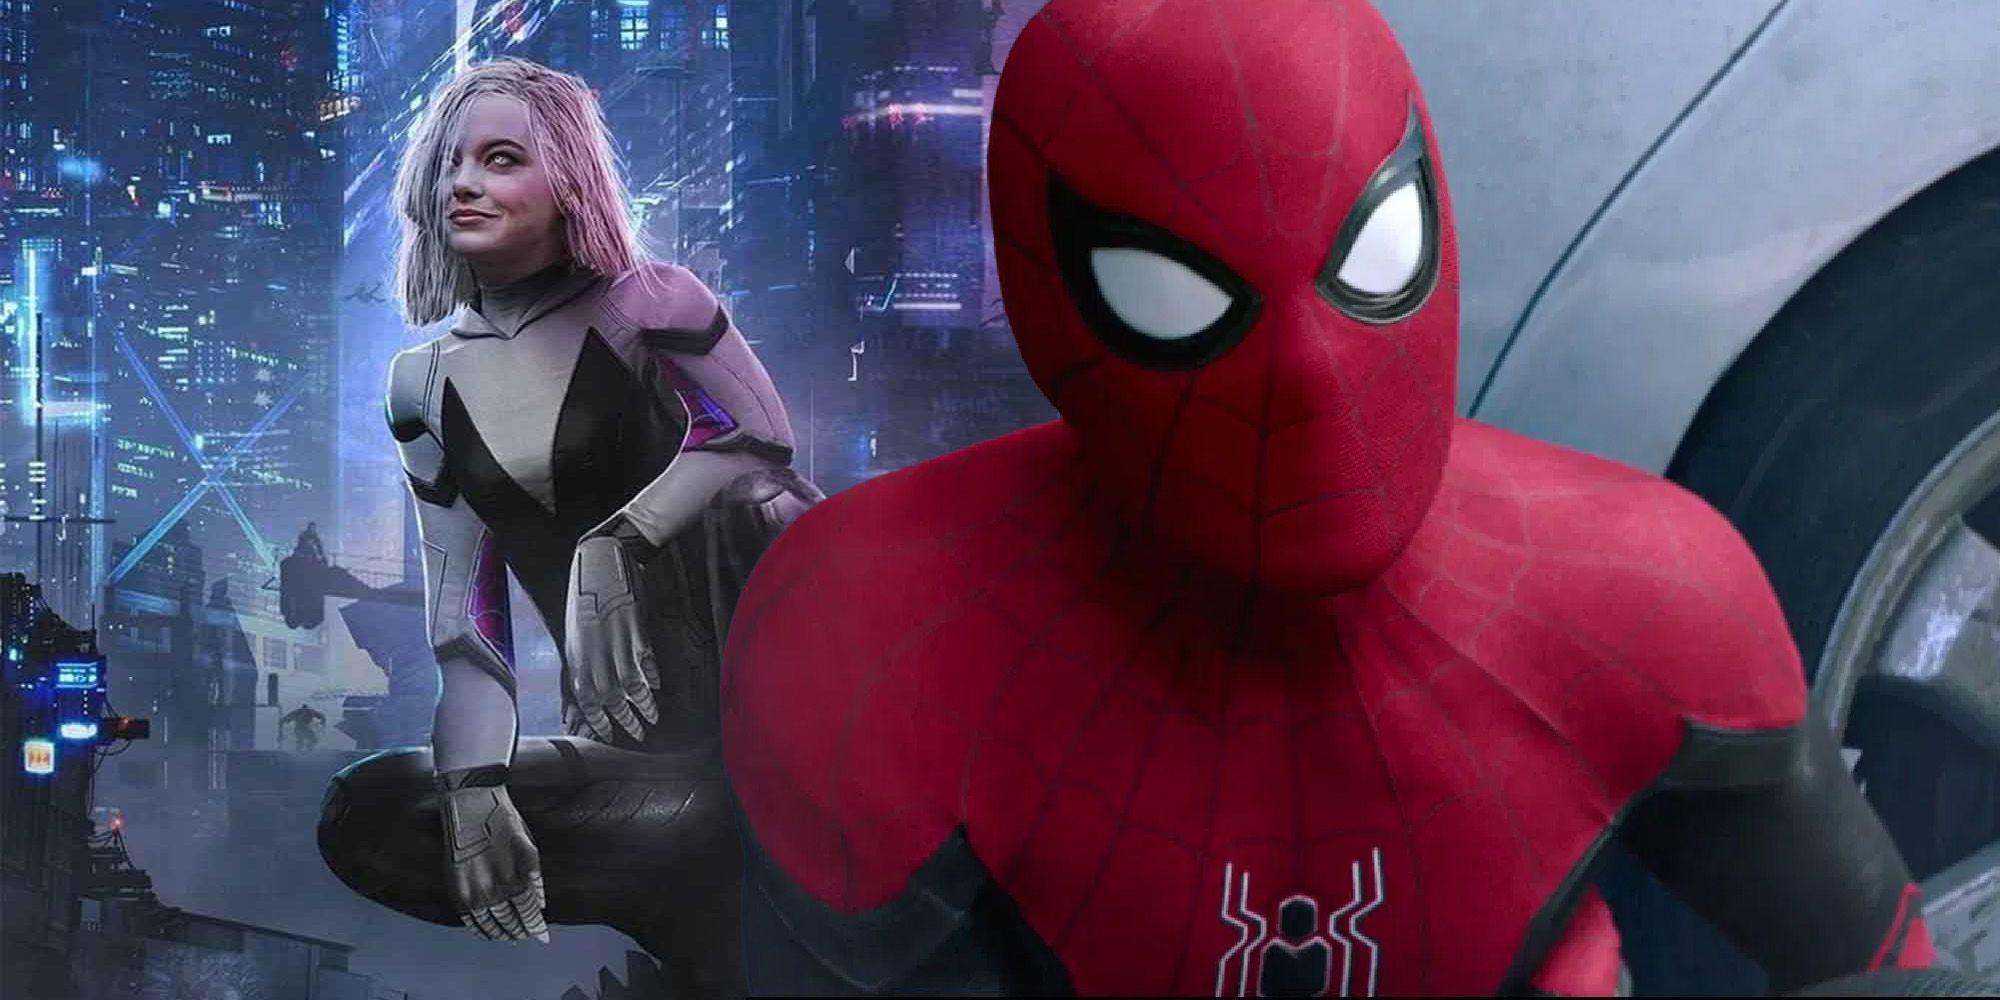 Theory: Spider-Man 3 Sets Up Emma Stone's Spider-Gwen In MCU